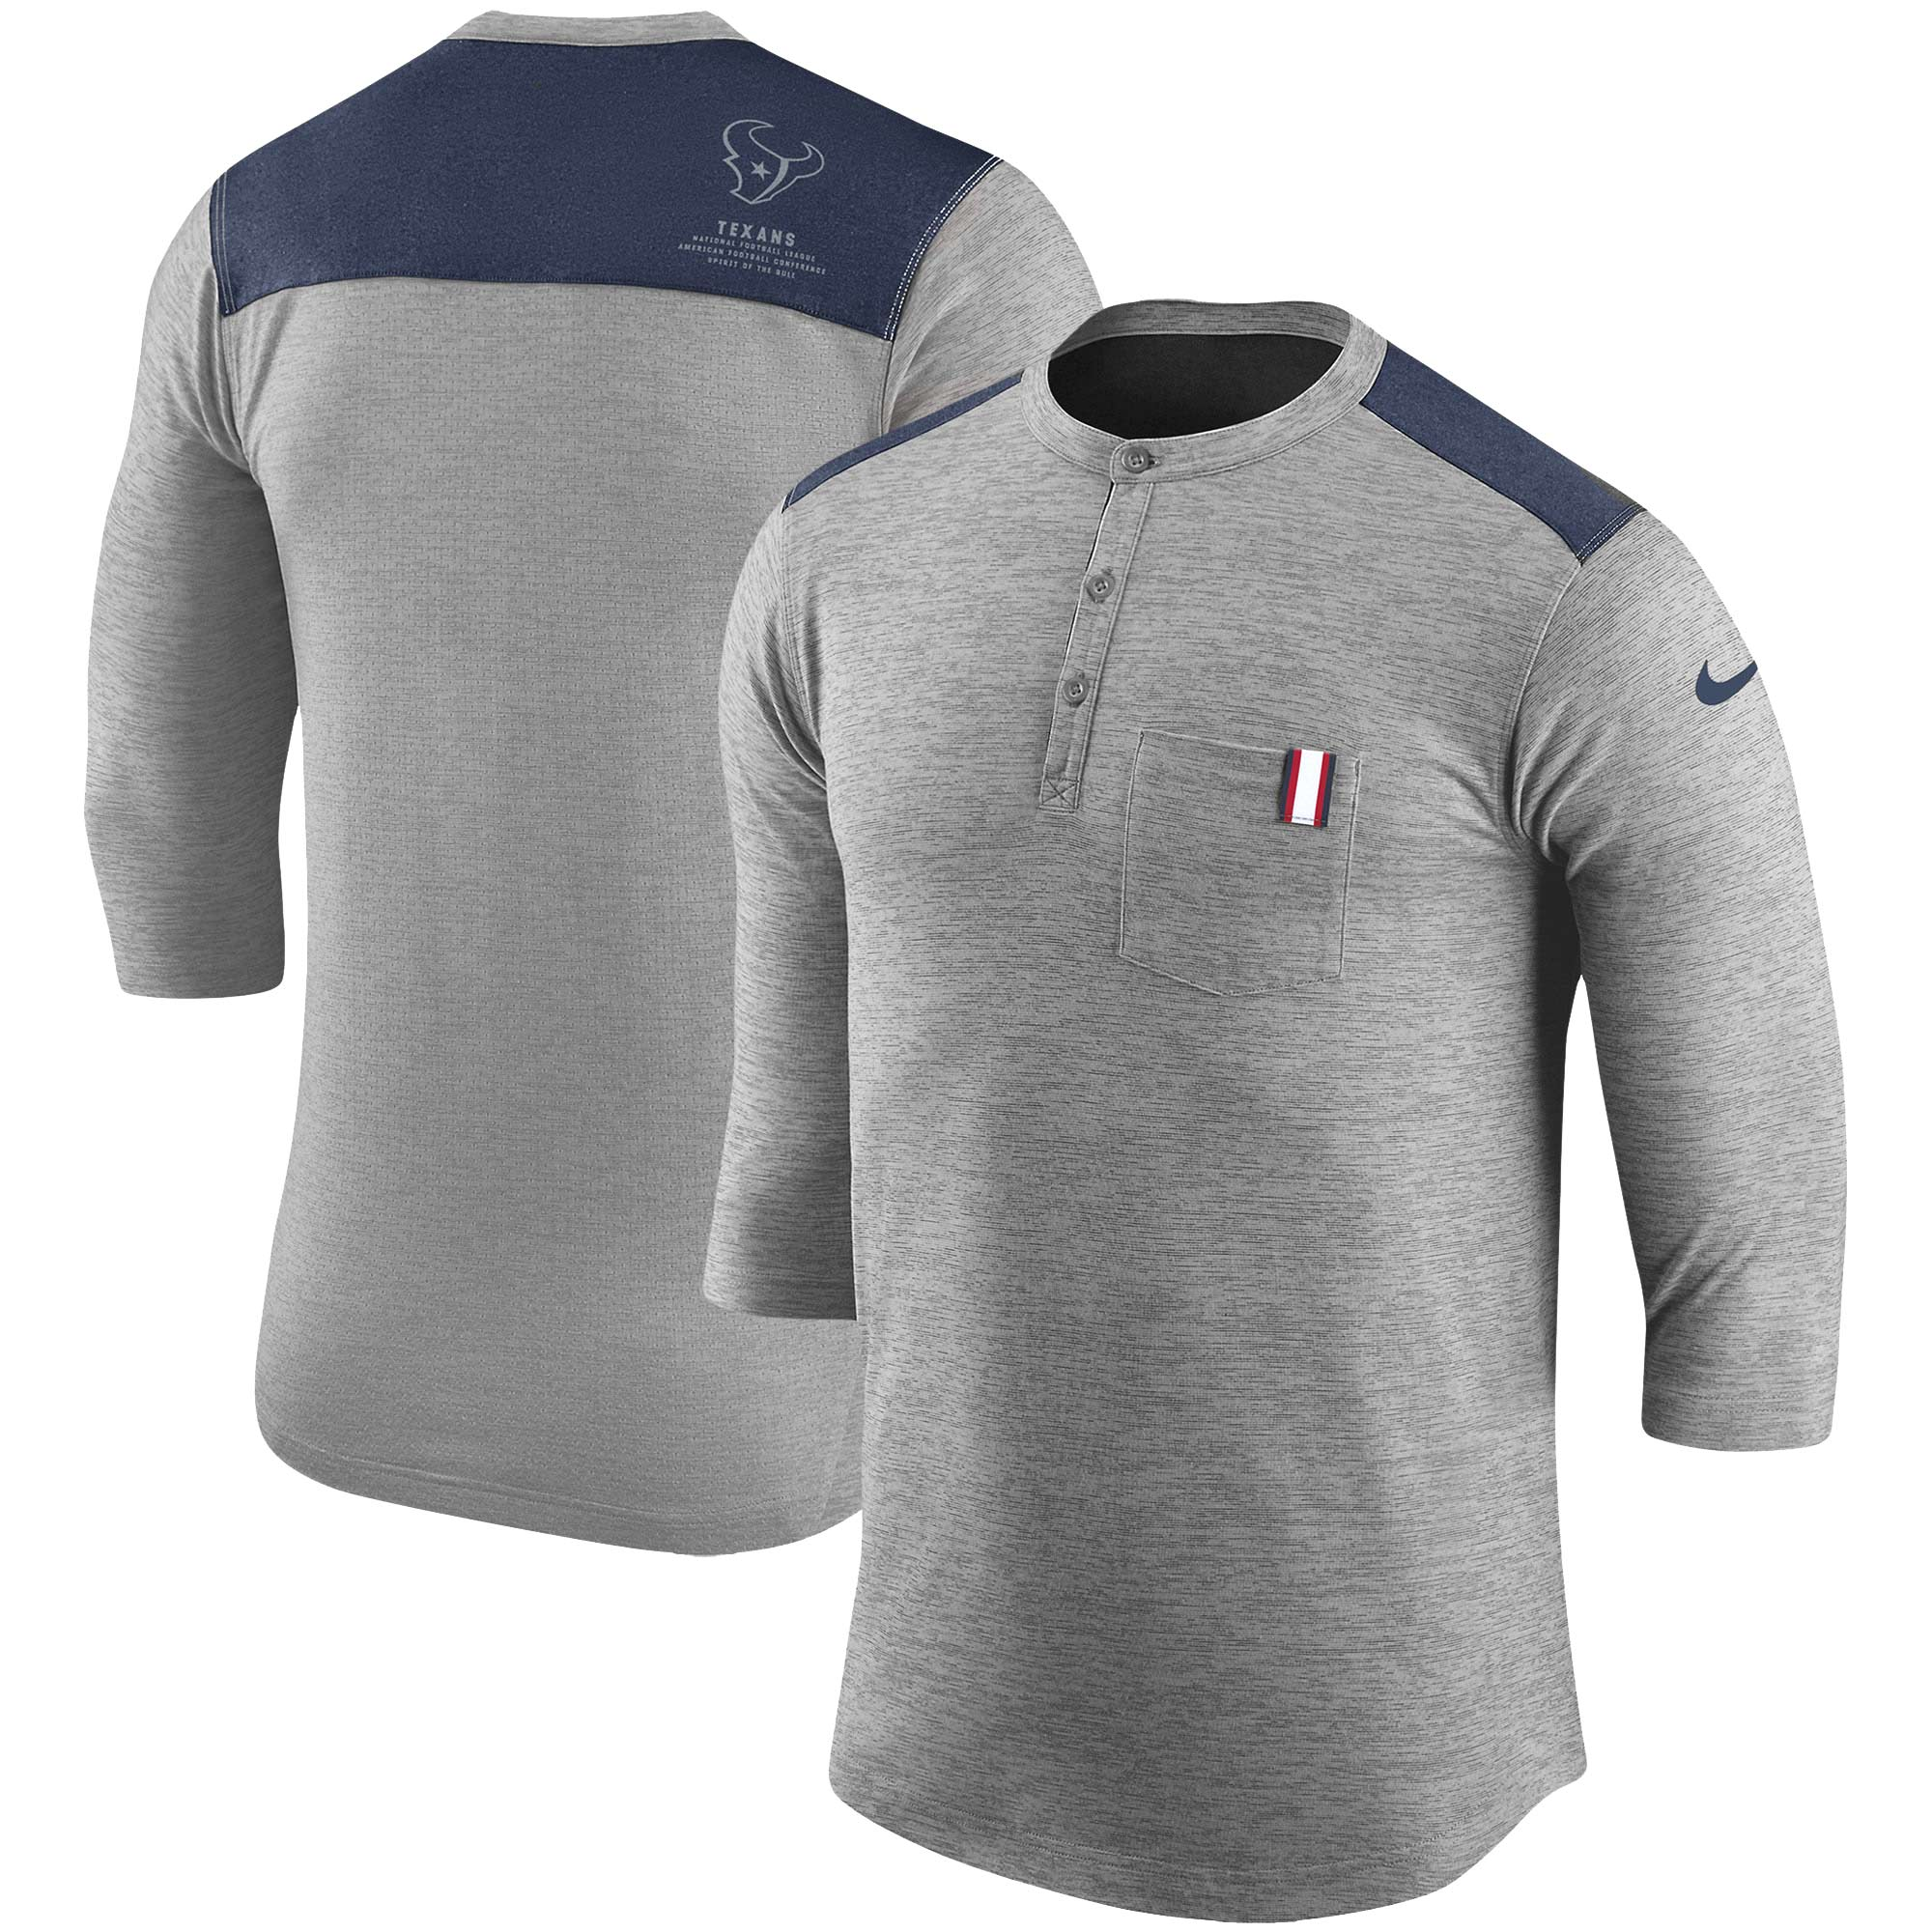 Houston Texans Nike Performance Henley 3/4-Sleeve T-Shirt - Heathered Gray/Navy